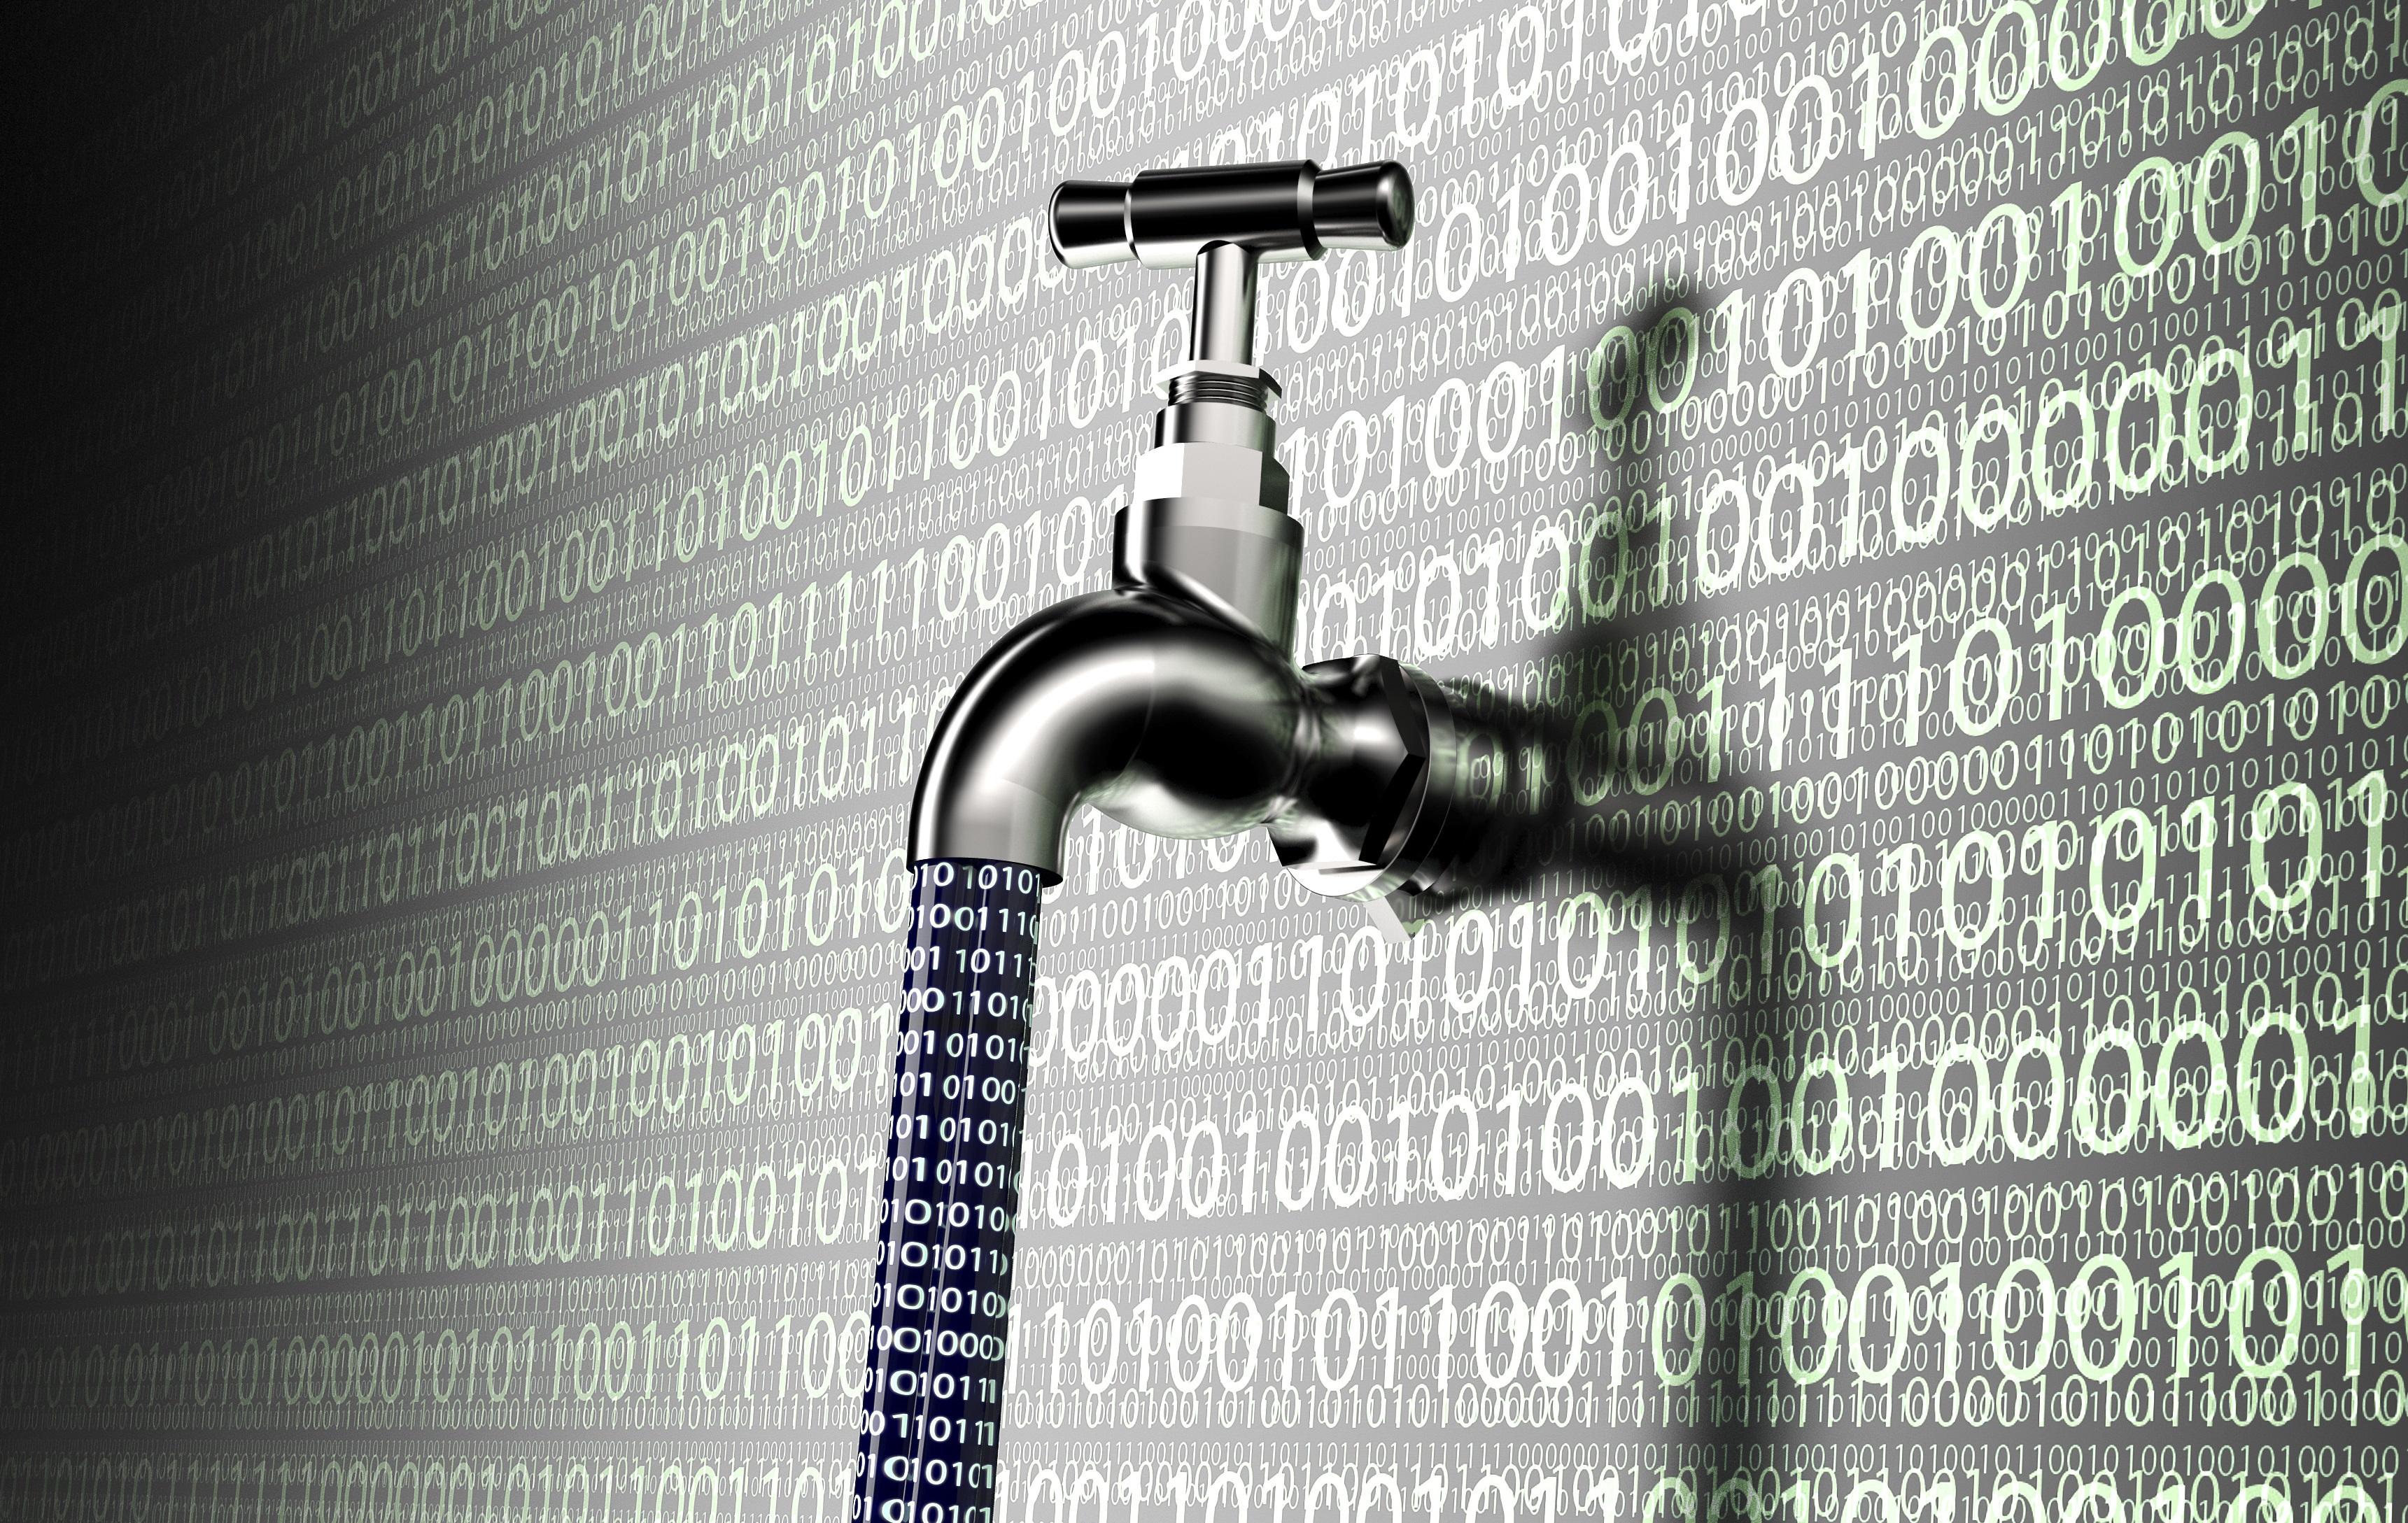 Leaky Backup Spills 157 GB of Automaker Secrets